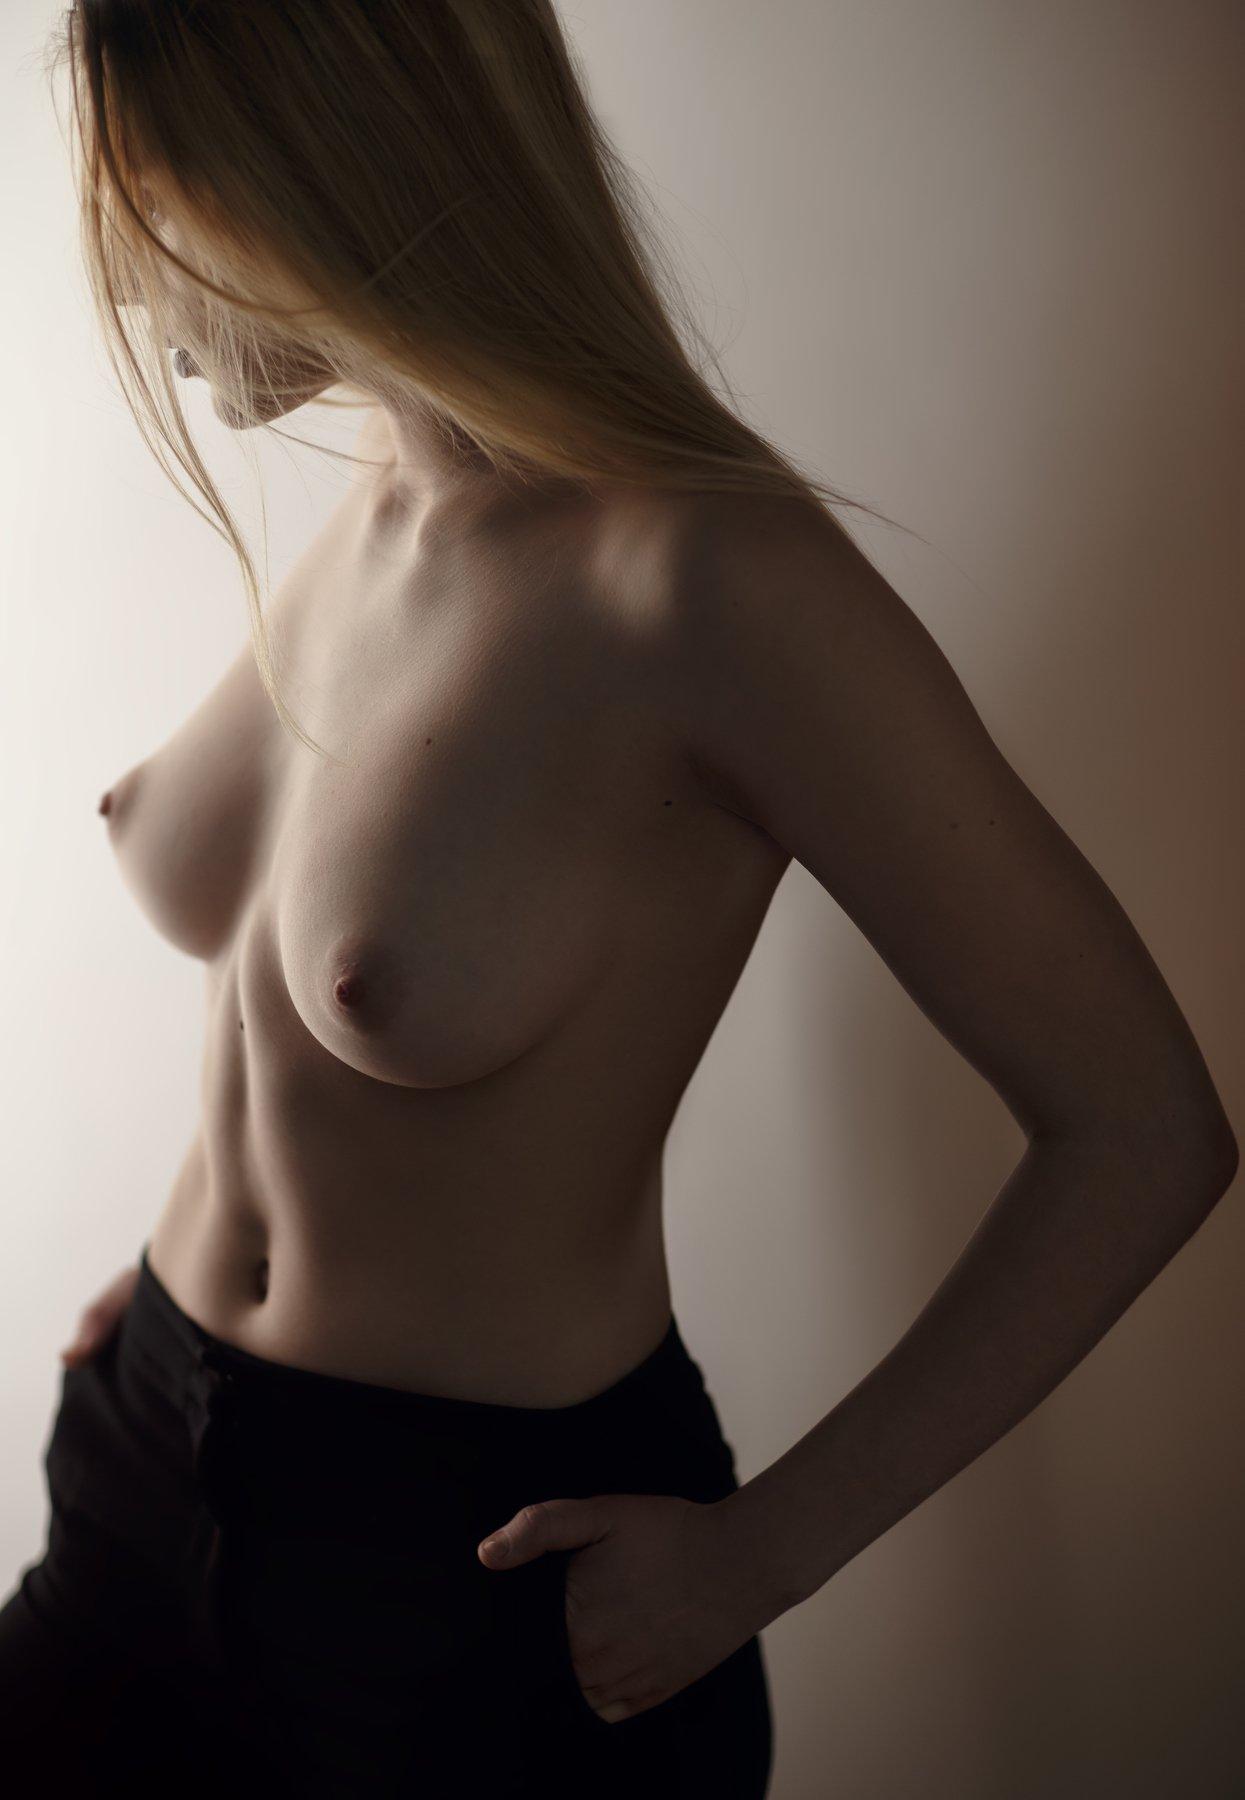 art, artnude, beautiful, girl, light, nu, nude, sexy, studio, sweet, woman, ню, девушка, модель, ню, портрет, portrait, Сергей Сорокин